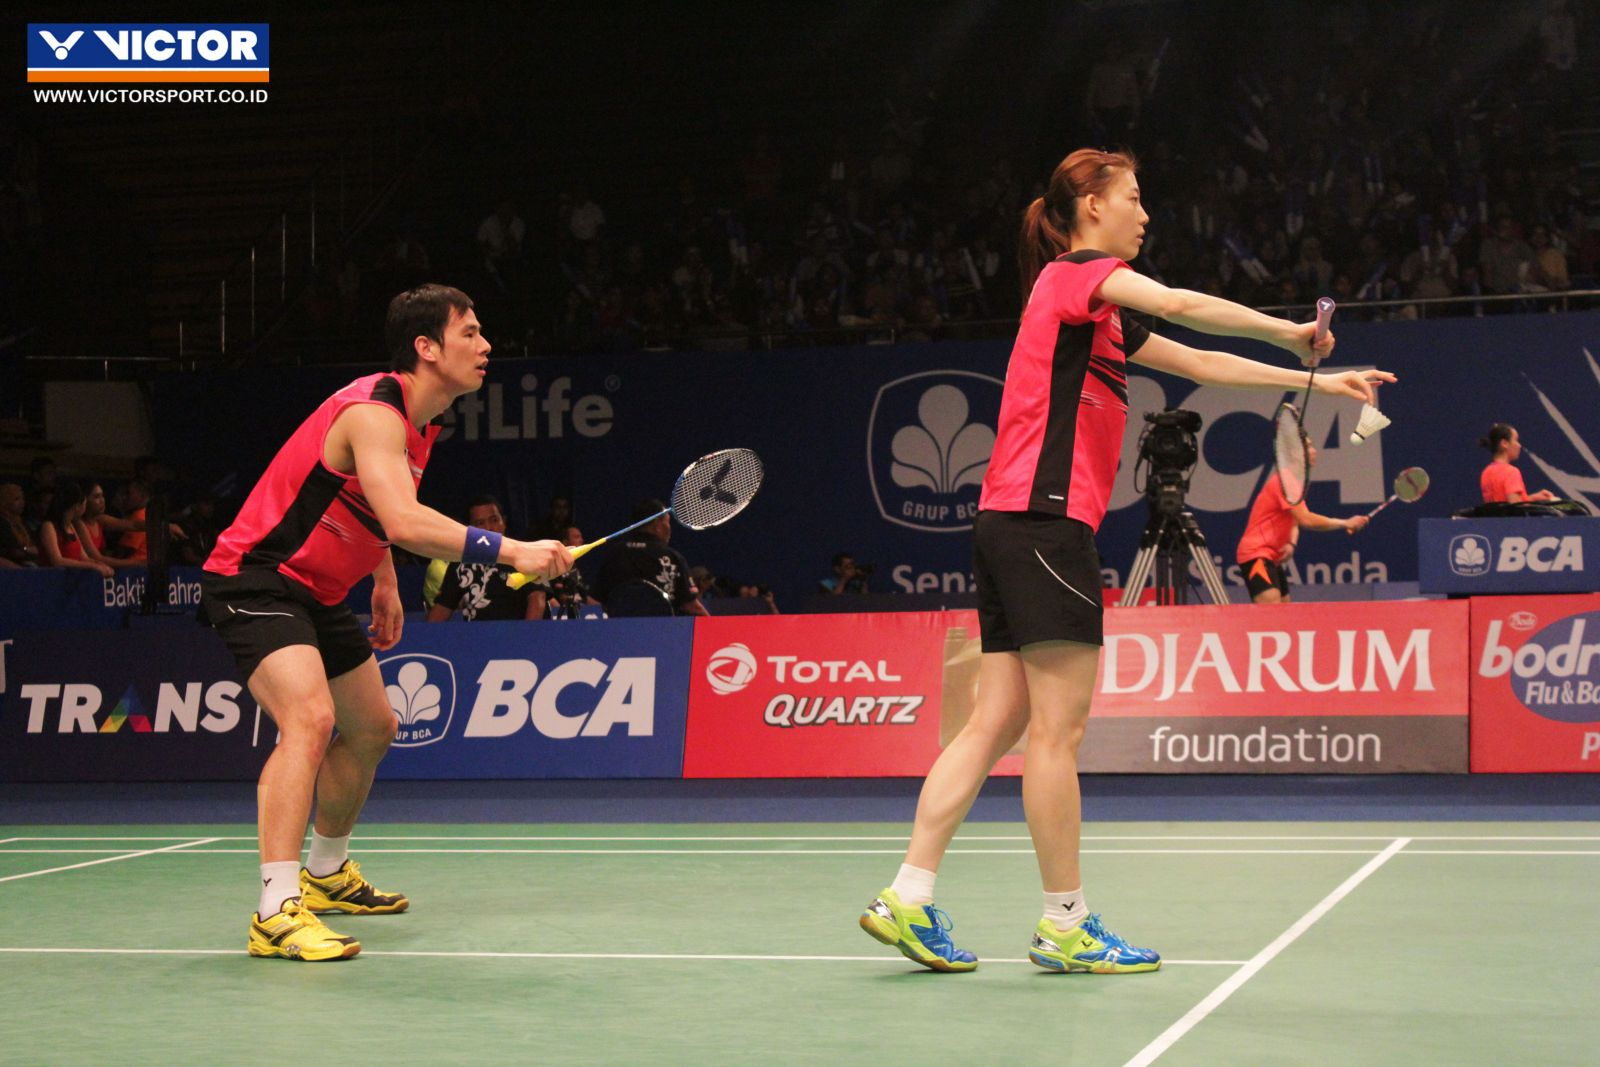 Indonesia Open 2015 Ko Sung Hyun dan Kim Ha Na melaju ke babak